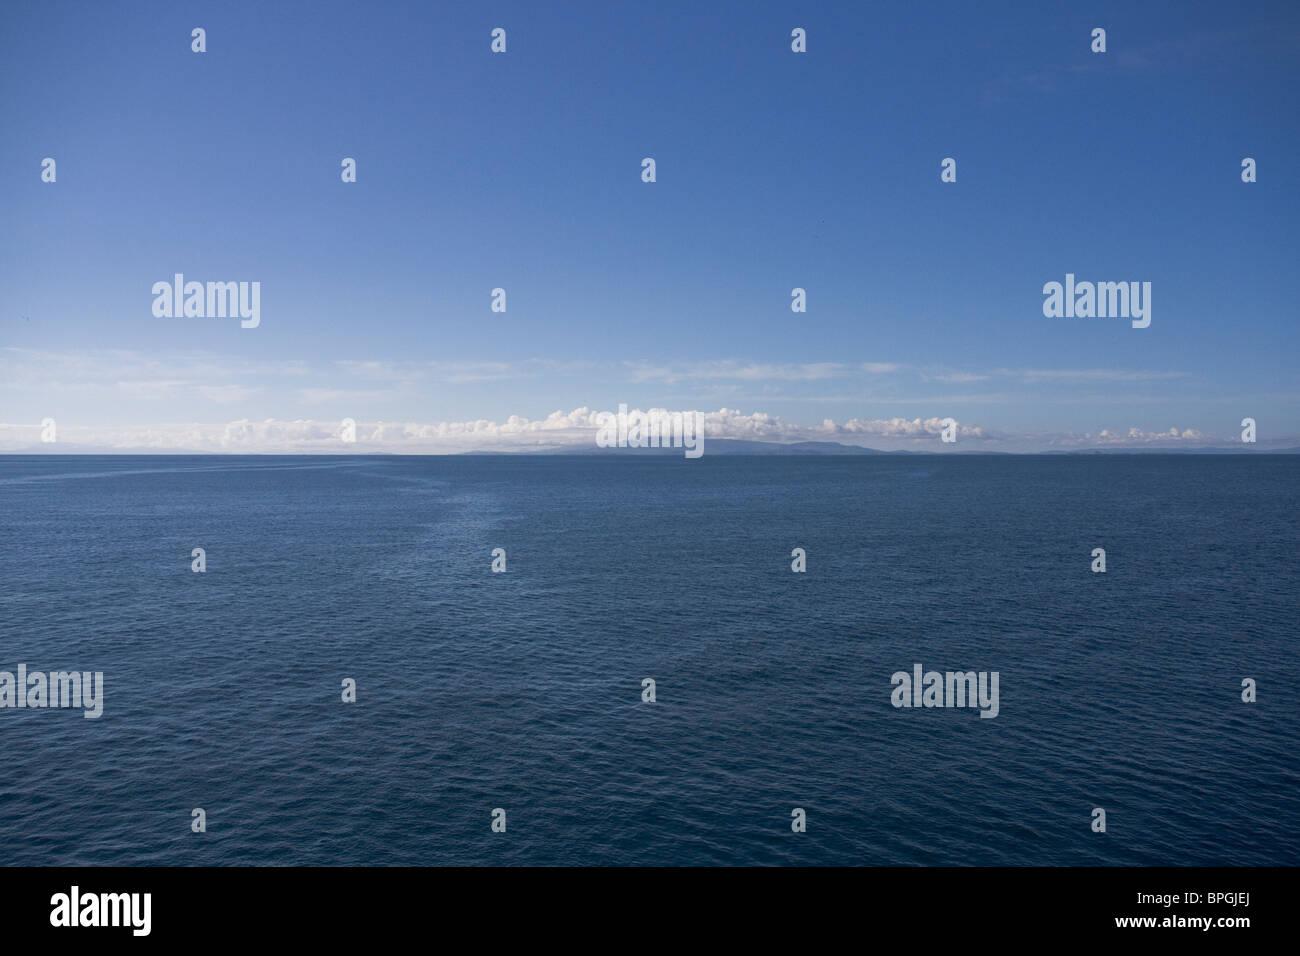 Isle of Skye from the Minch, Scotland Stock Photo